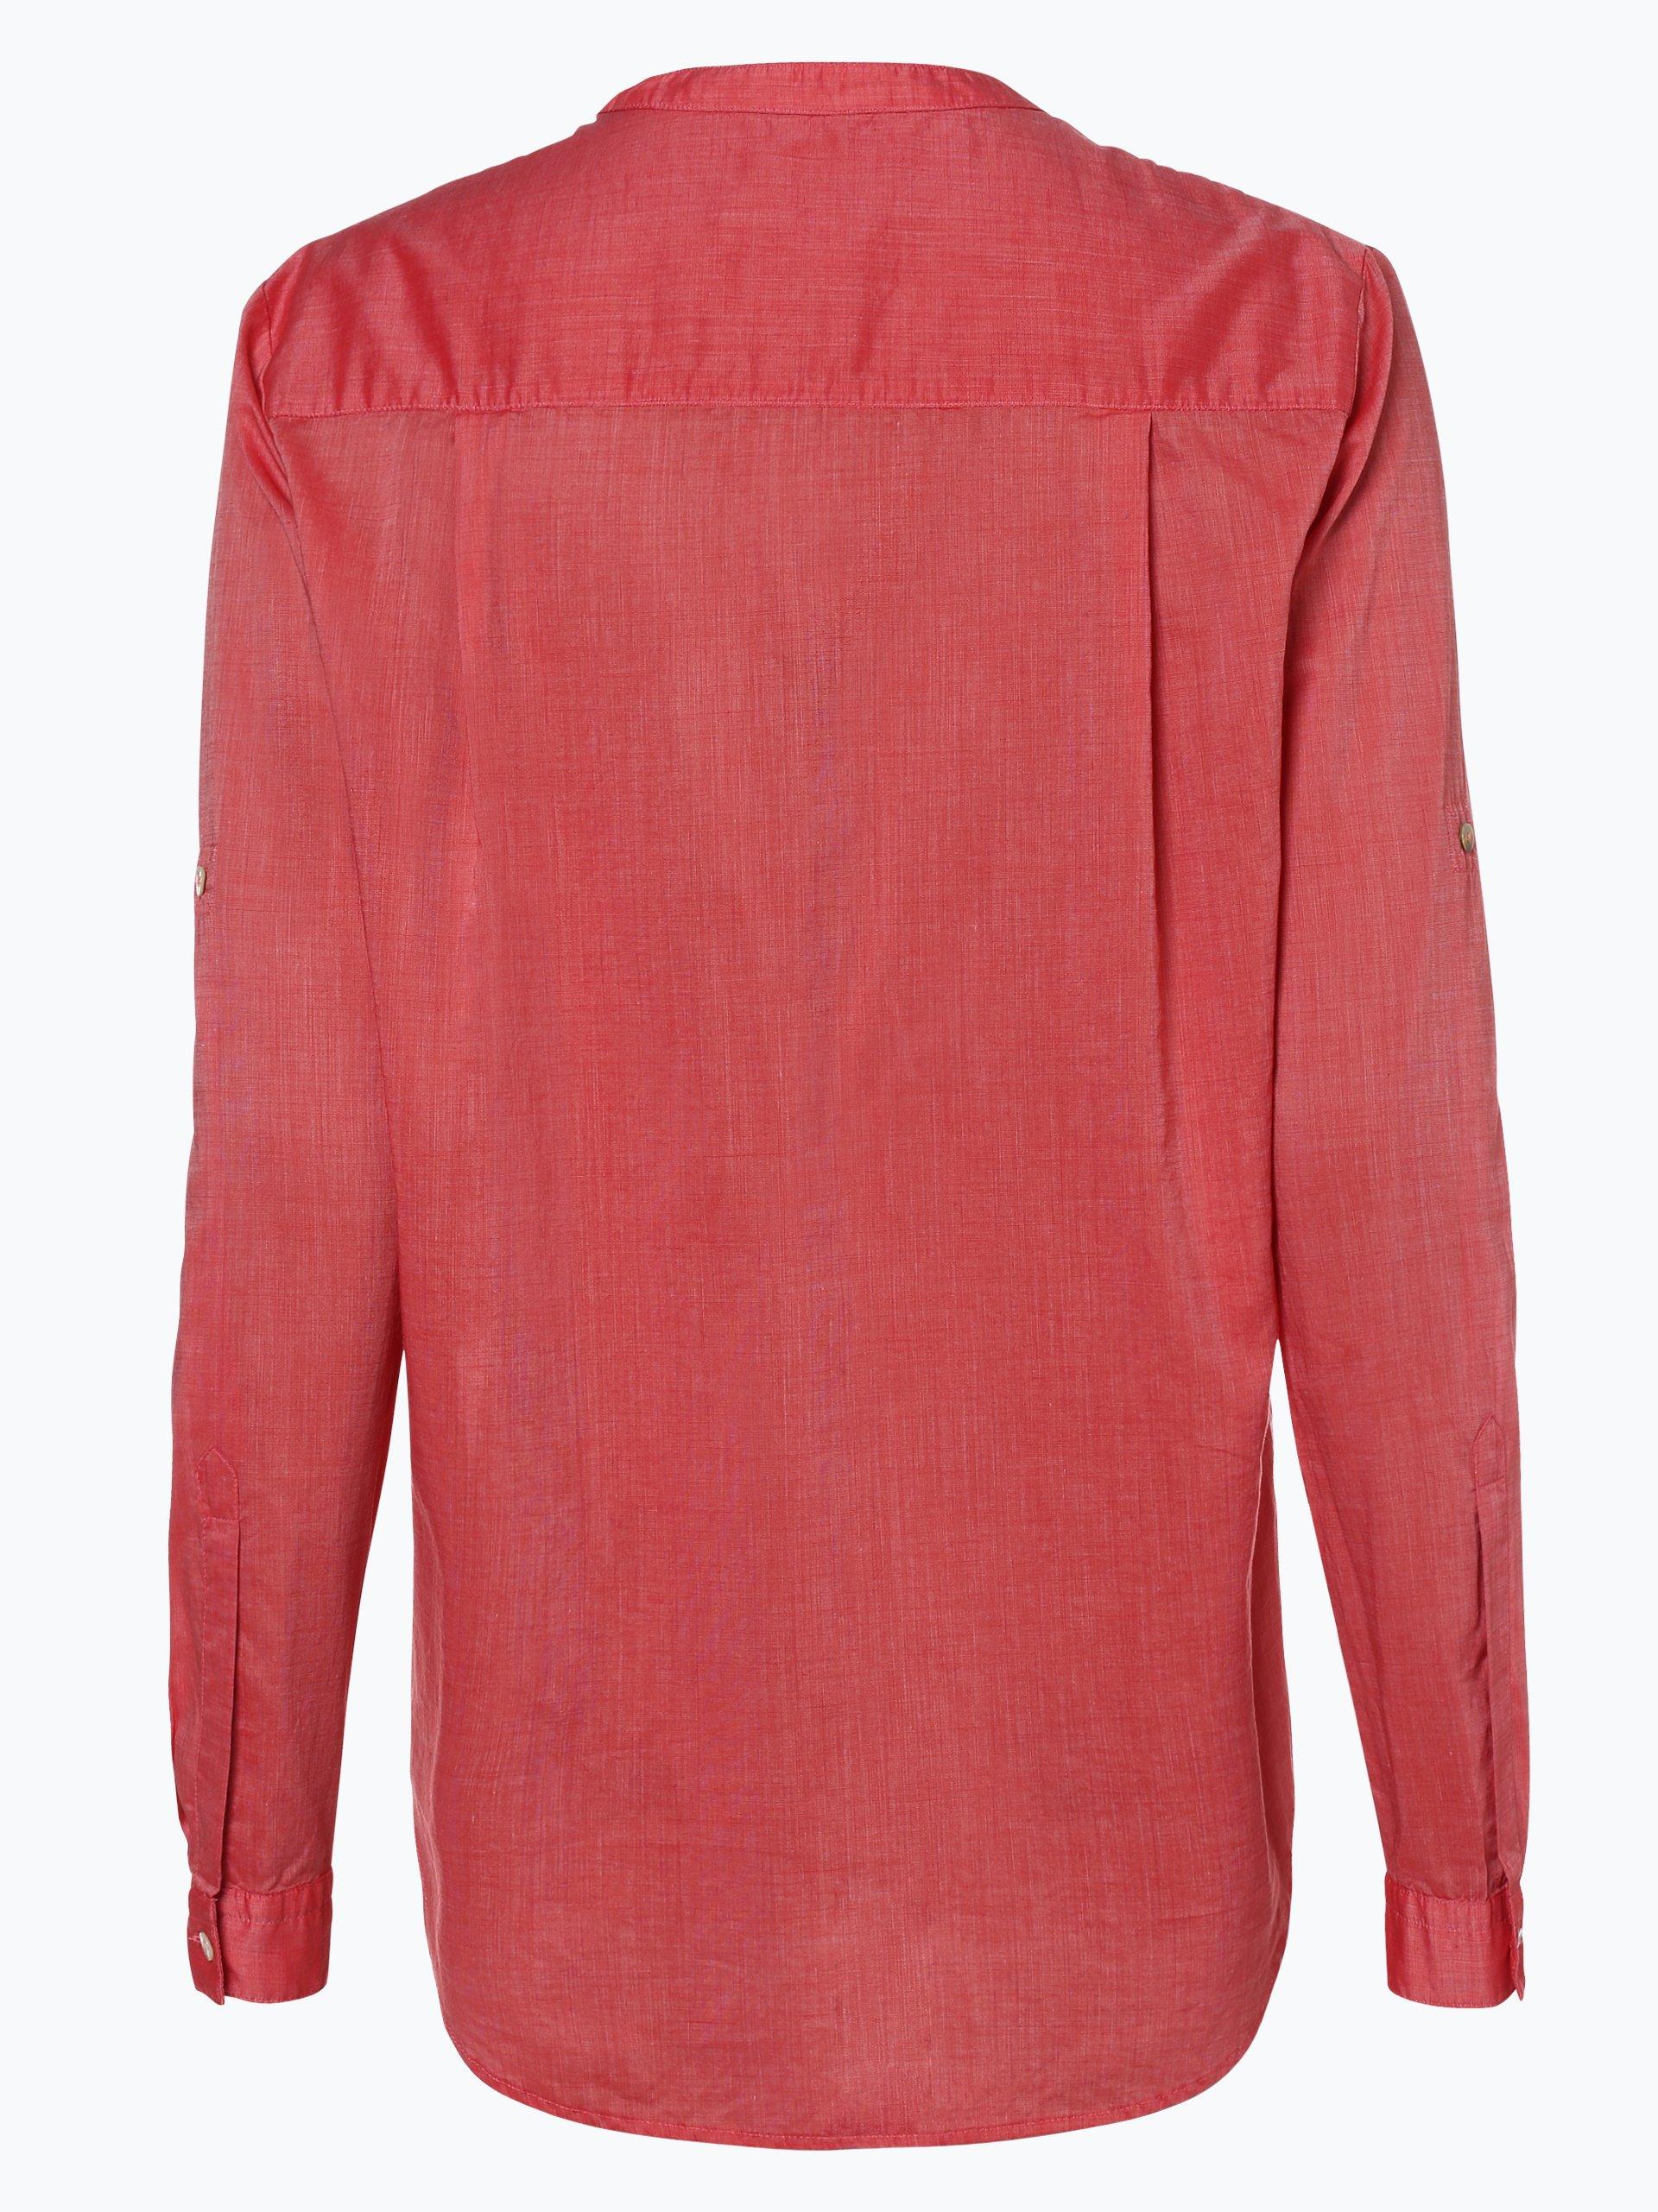 boss orange damen bluse efilize 12 rot uni online kaufen peek und cloppenburg de. Black Bedroom Furniture Sets. Home Design Ideas